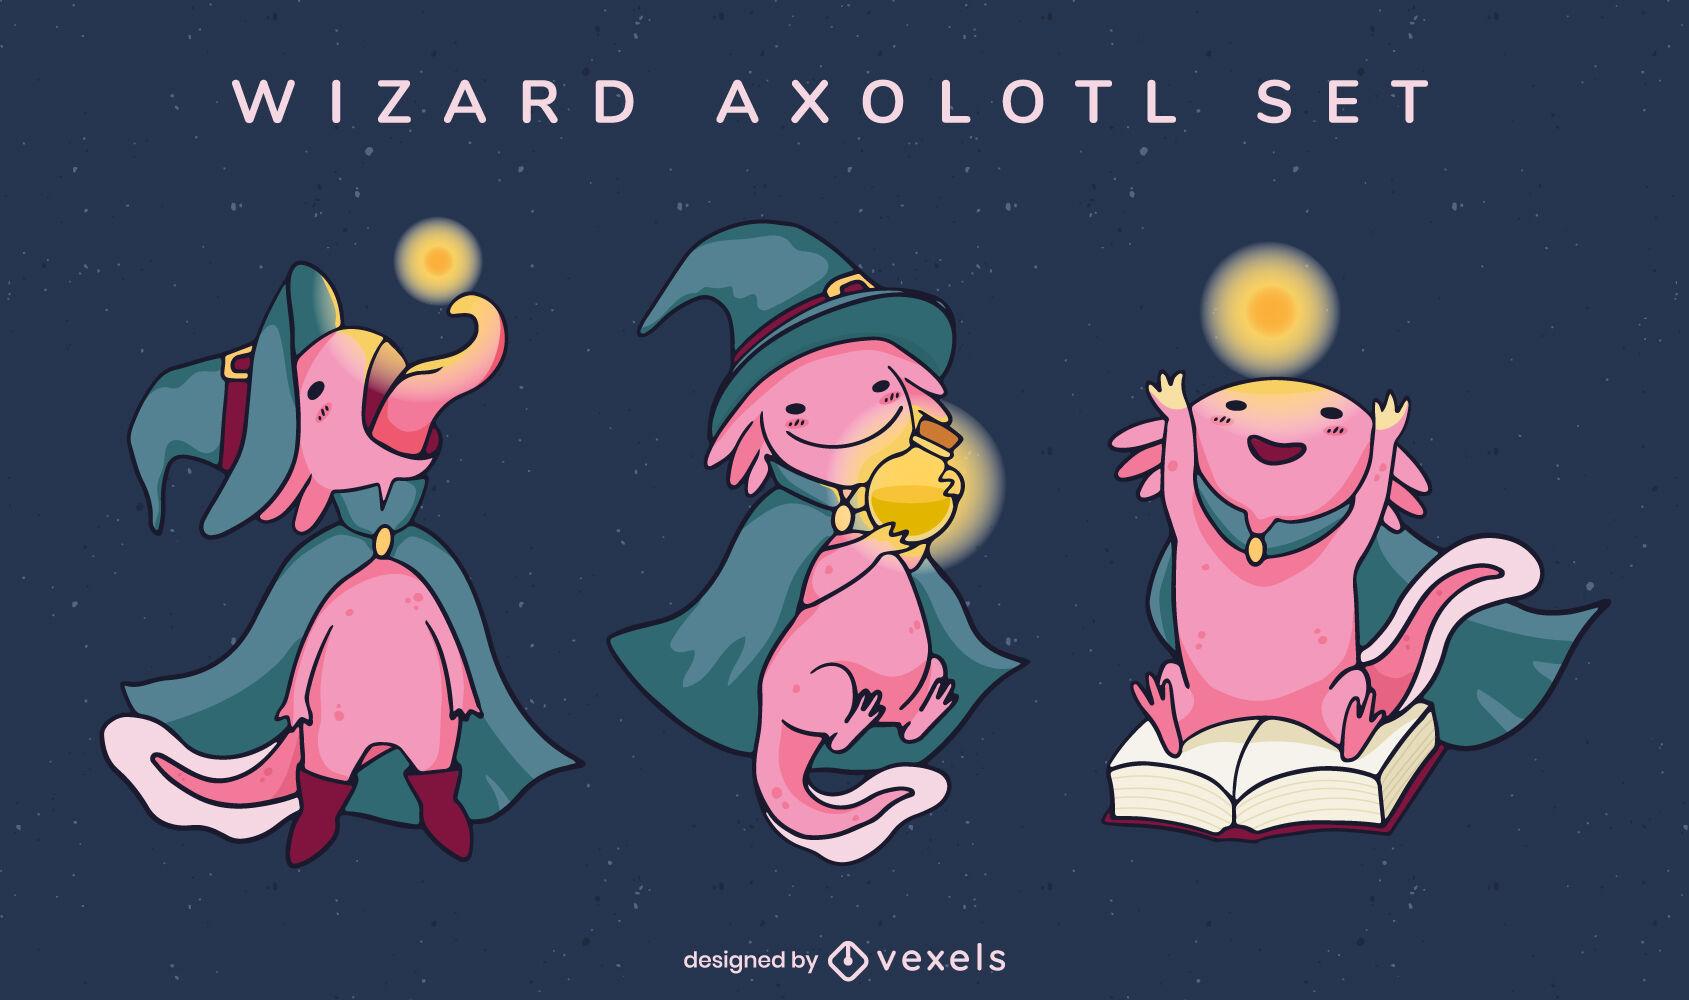 Conjunto de personagens mágicos de animais axolotl assistente